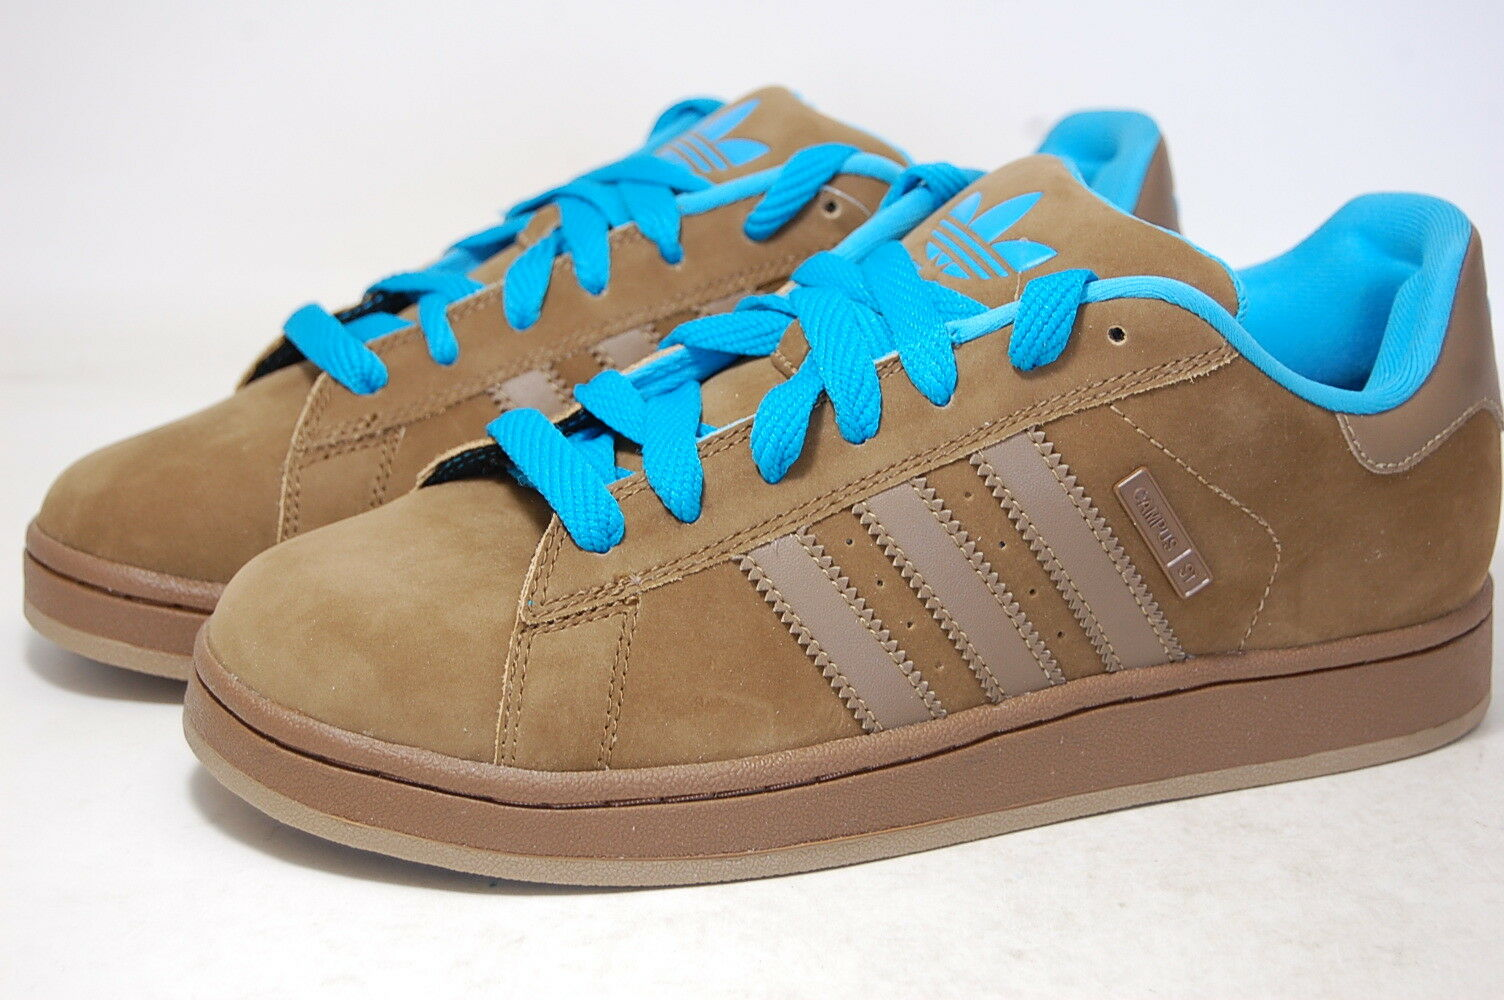 Adidas ST 163178 Leather Men shoes Campus nttzcv4371 new